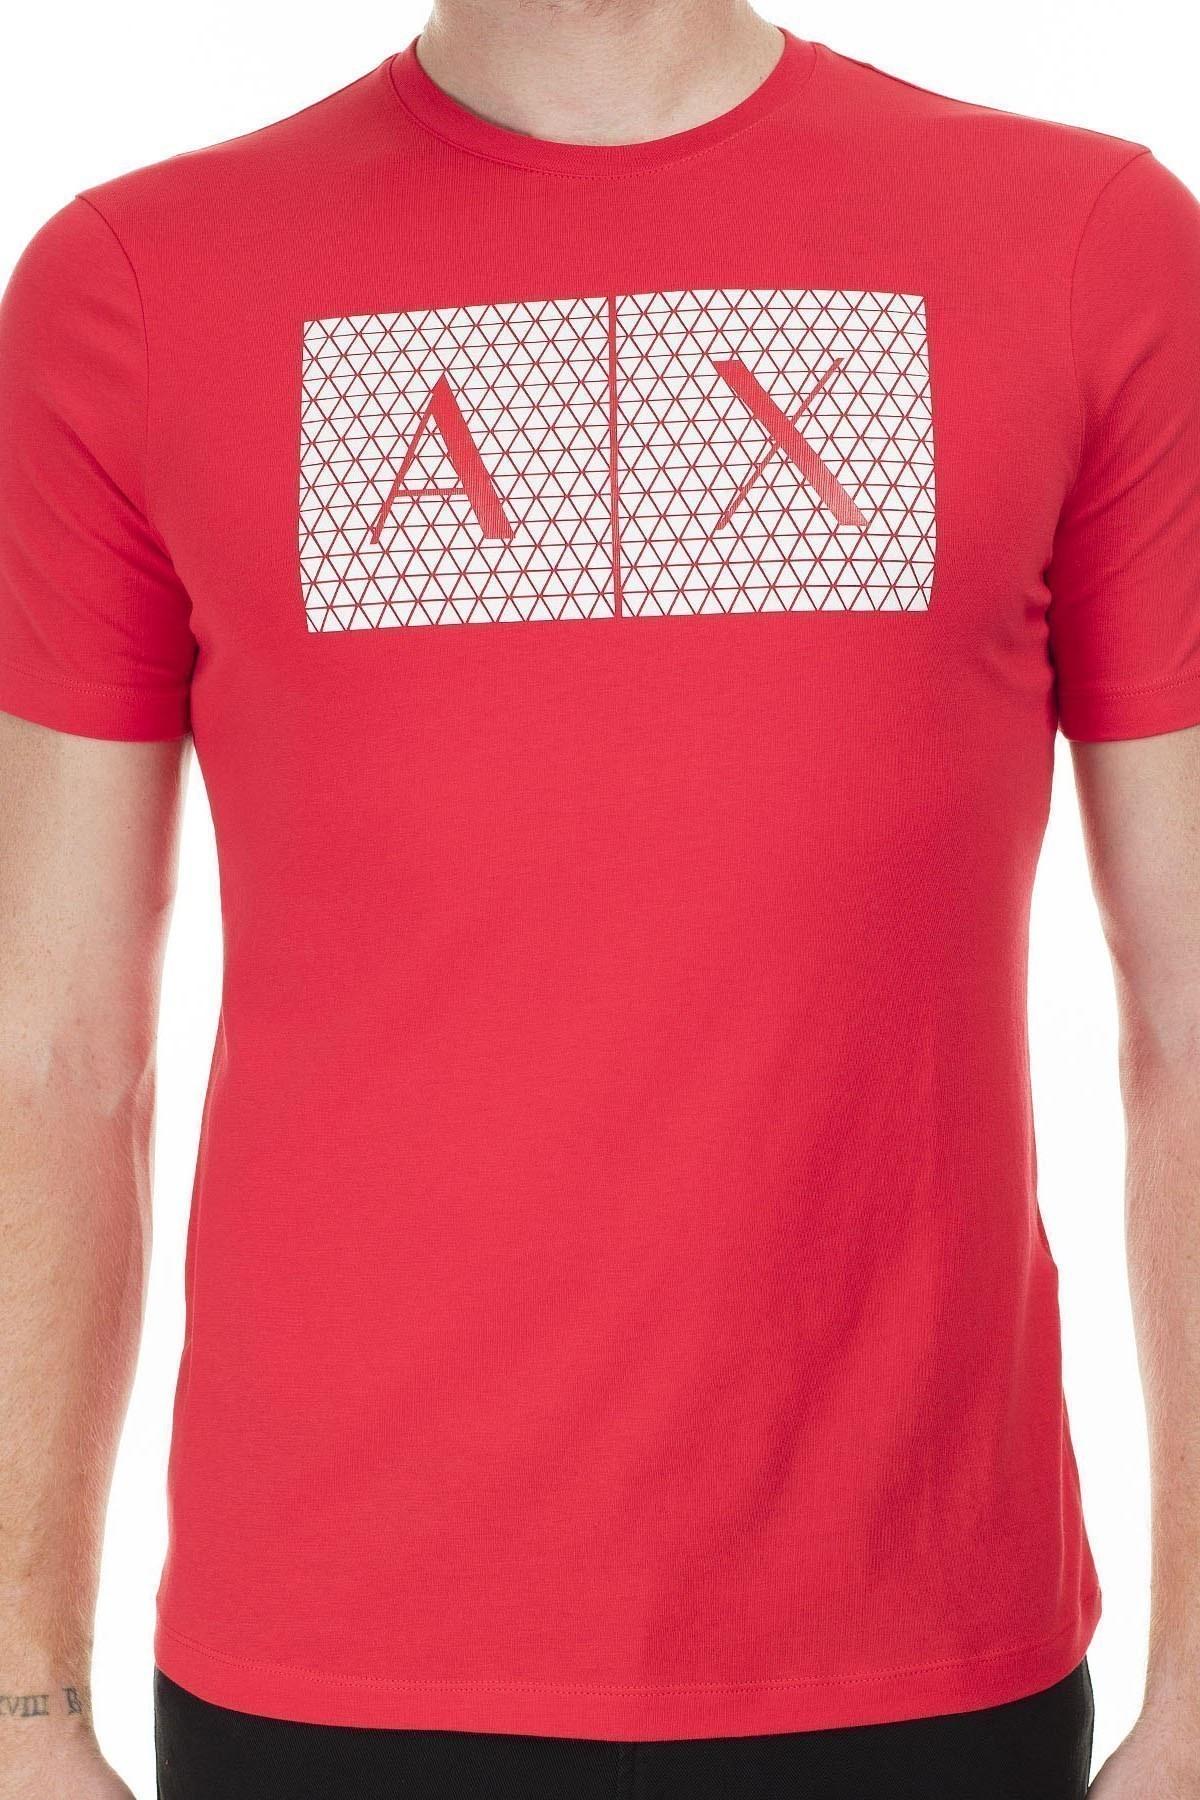 Armani Exchange Baskı Detaylı Bisiklet Yaka Erkek T Shirt 8NZTCK Z8H4Z 1400 KIRMIZI